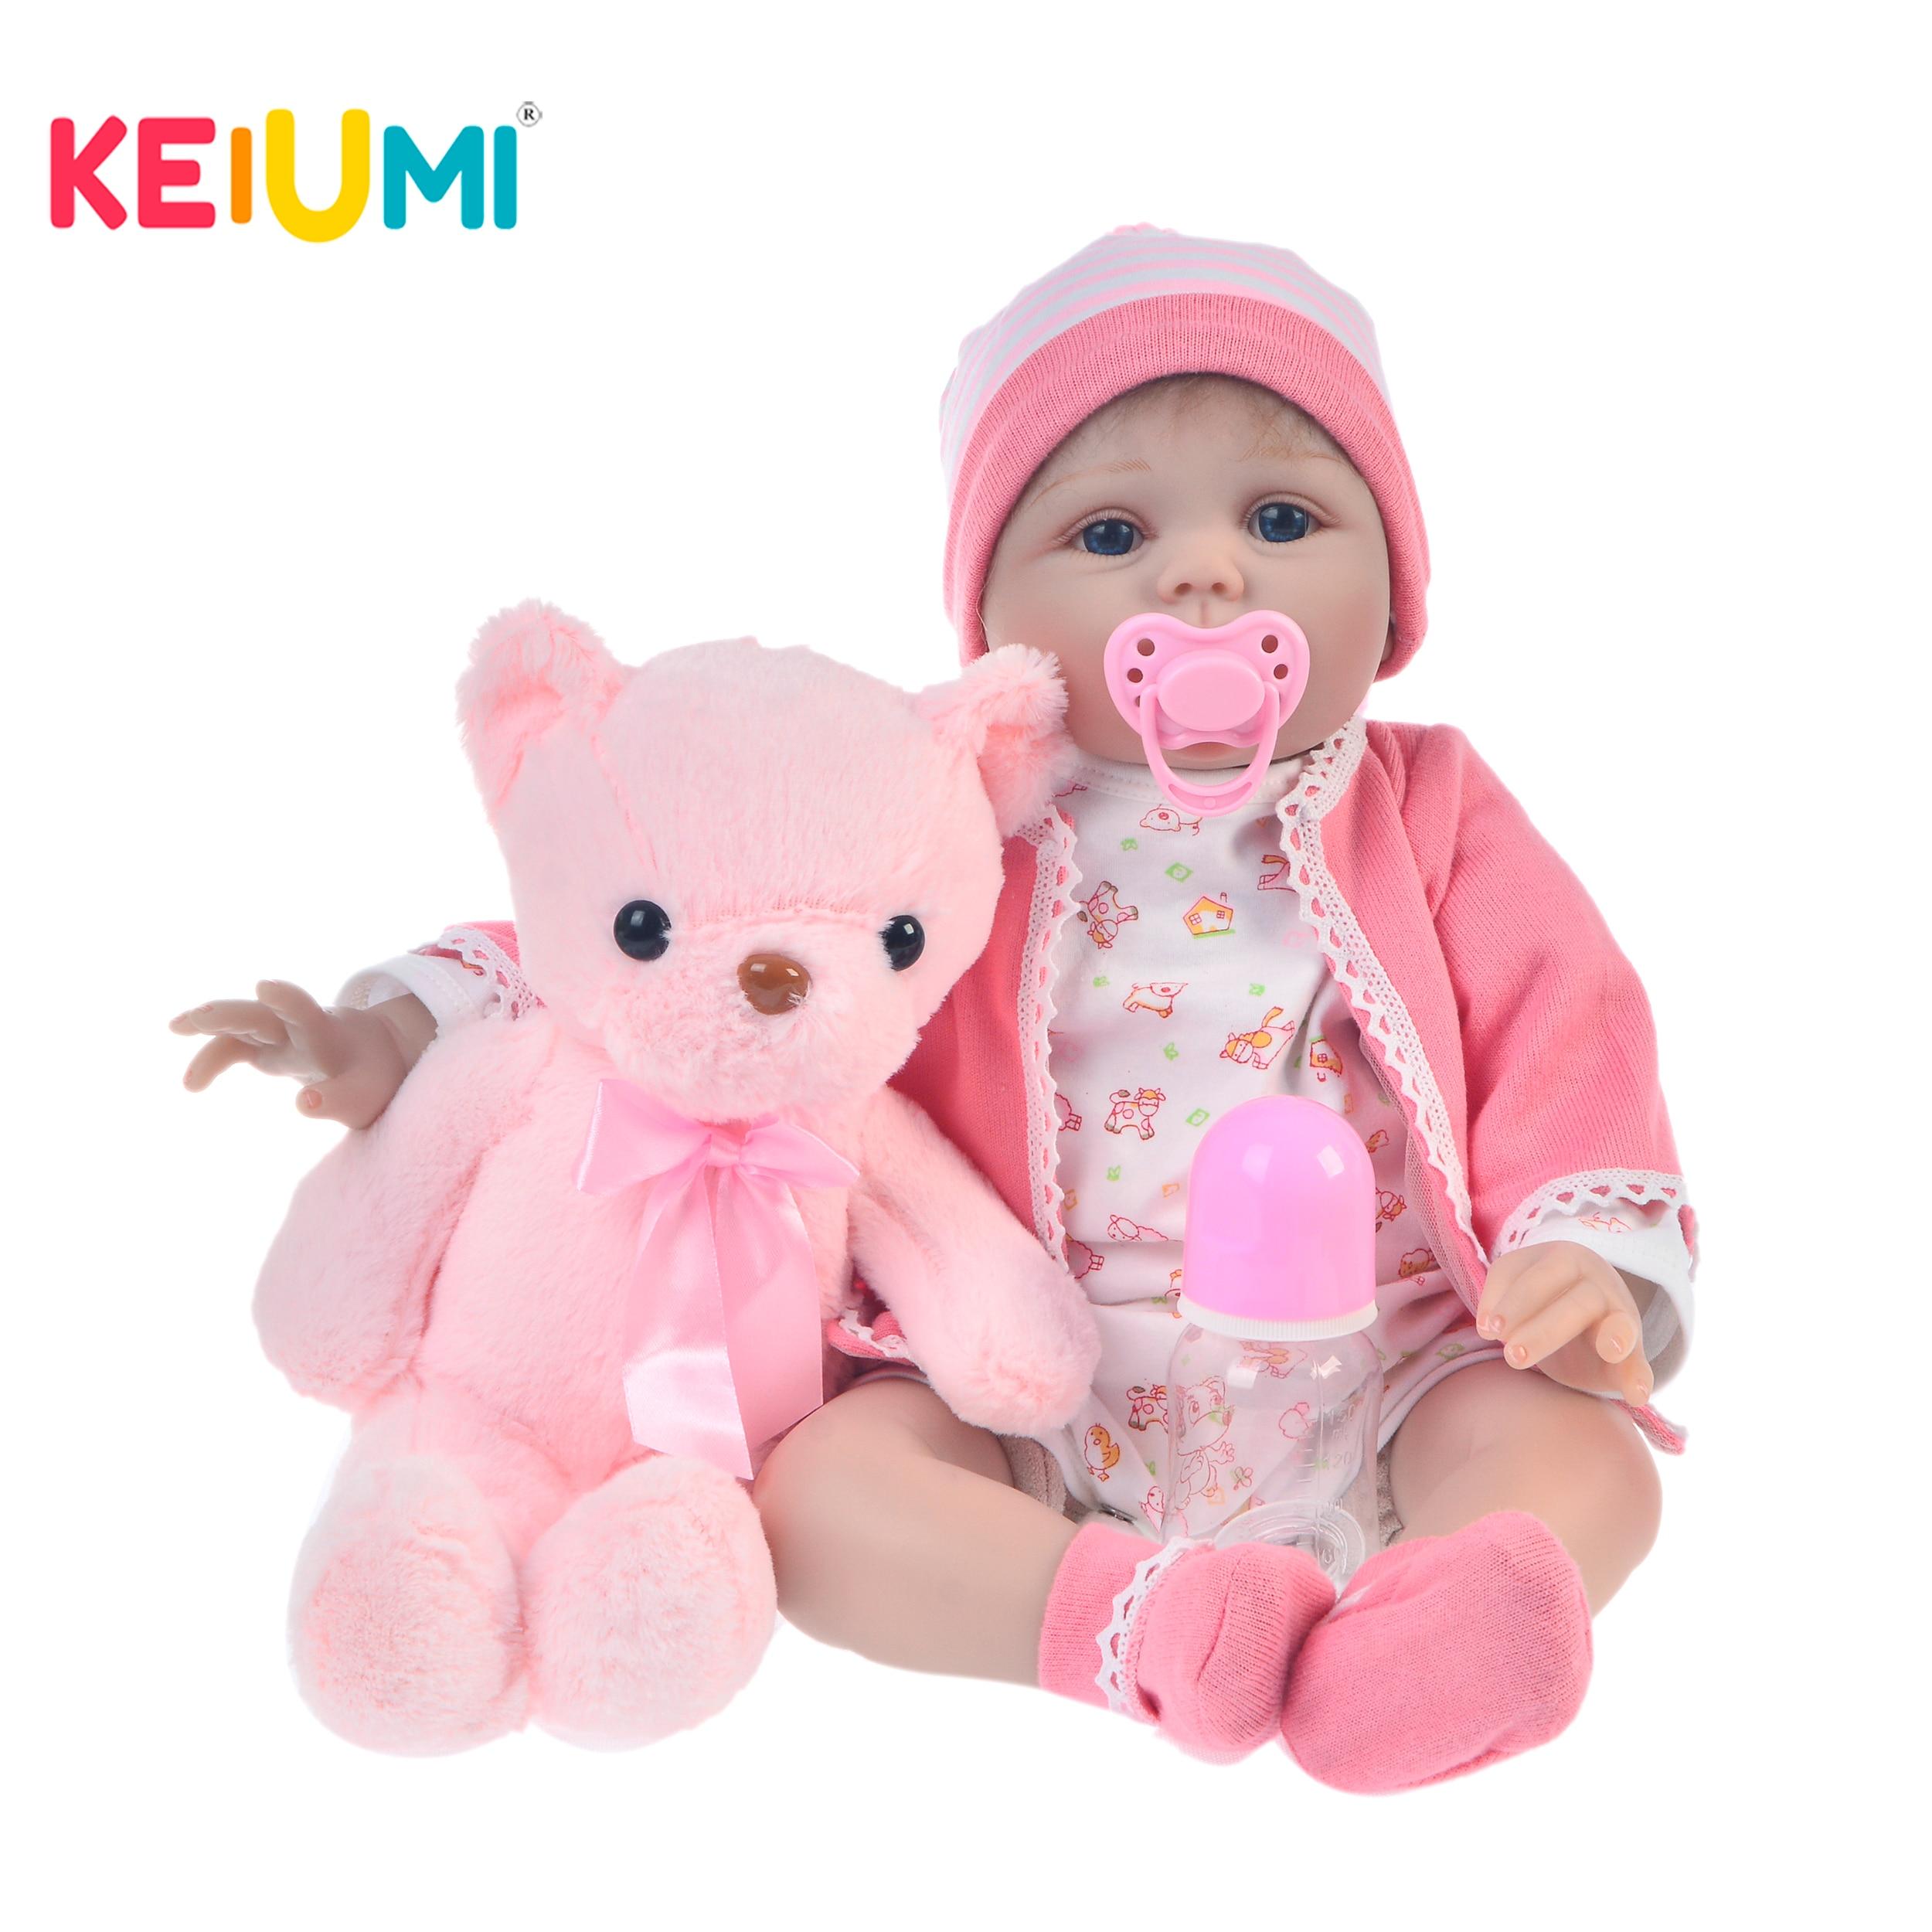 KEIUMI Fashion Soft Silicone Reborn Baby Doll 22 55 cm Lifelike Boneca Reborn Brinqudos For Kids